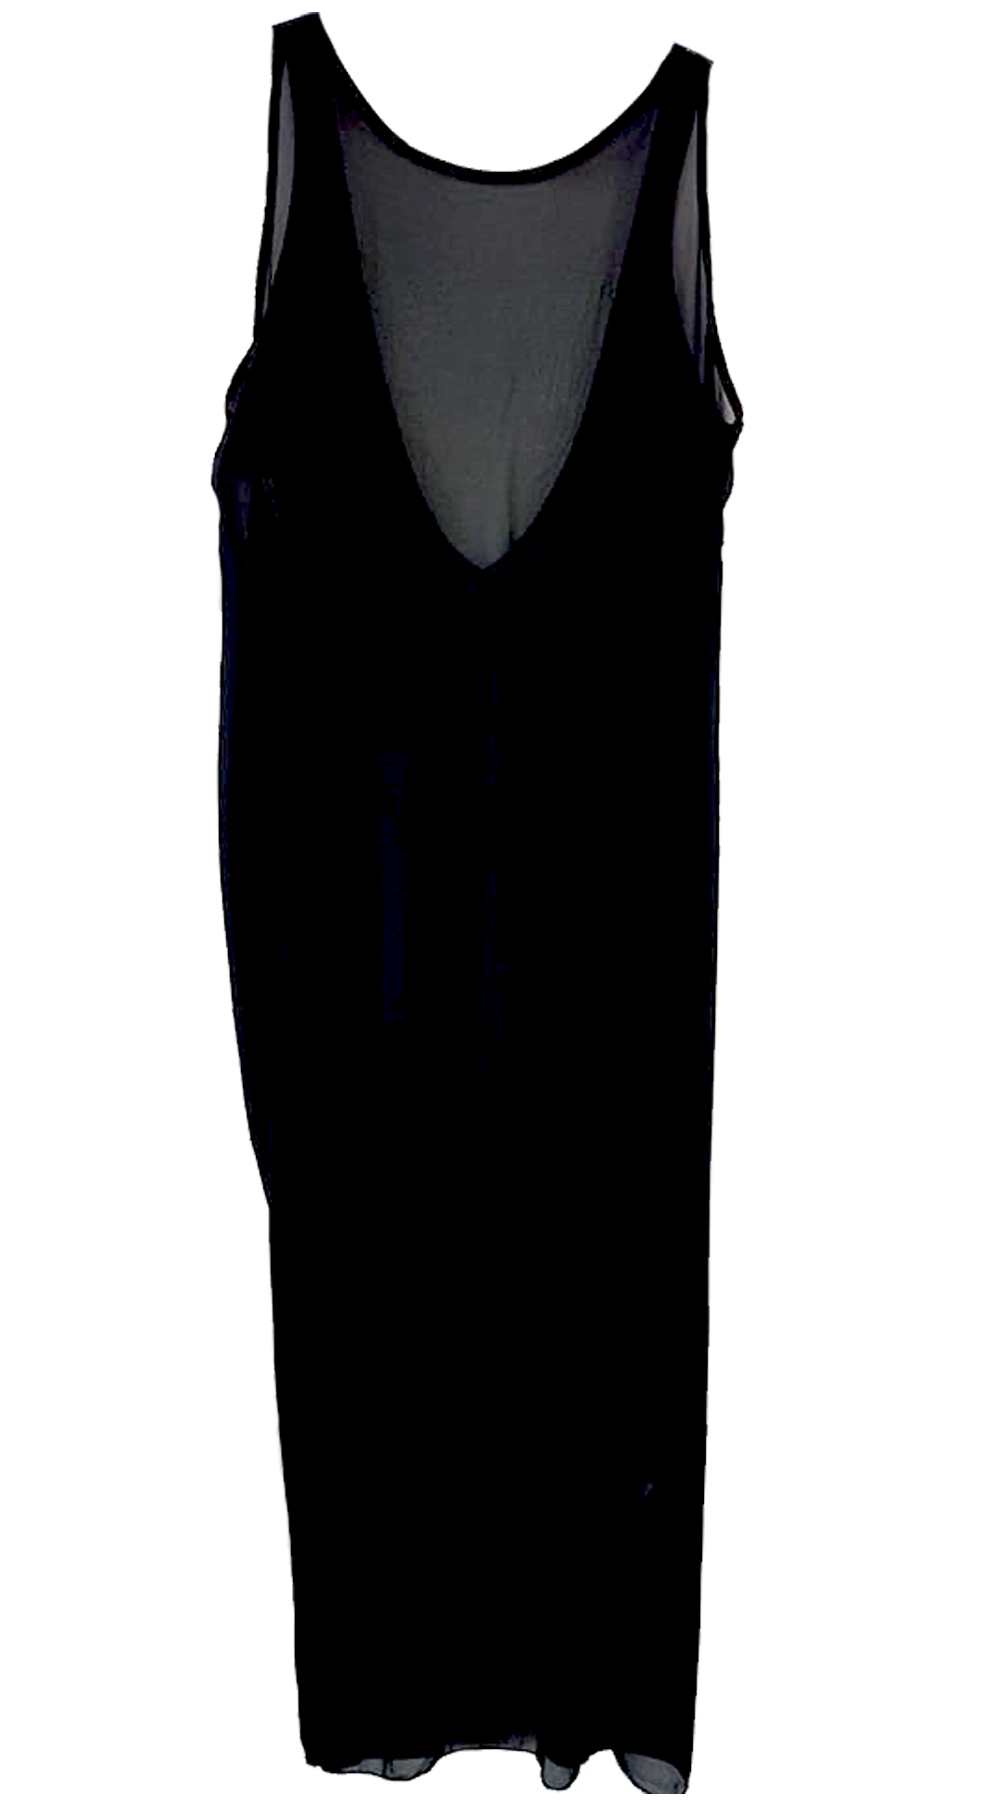 See Through Φόρεμα Καφτάνι - MissReina - SS18GAL-51315 ενδύματα κιμονό   καφτάνια